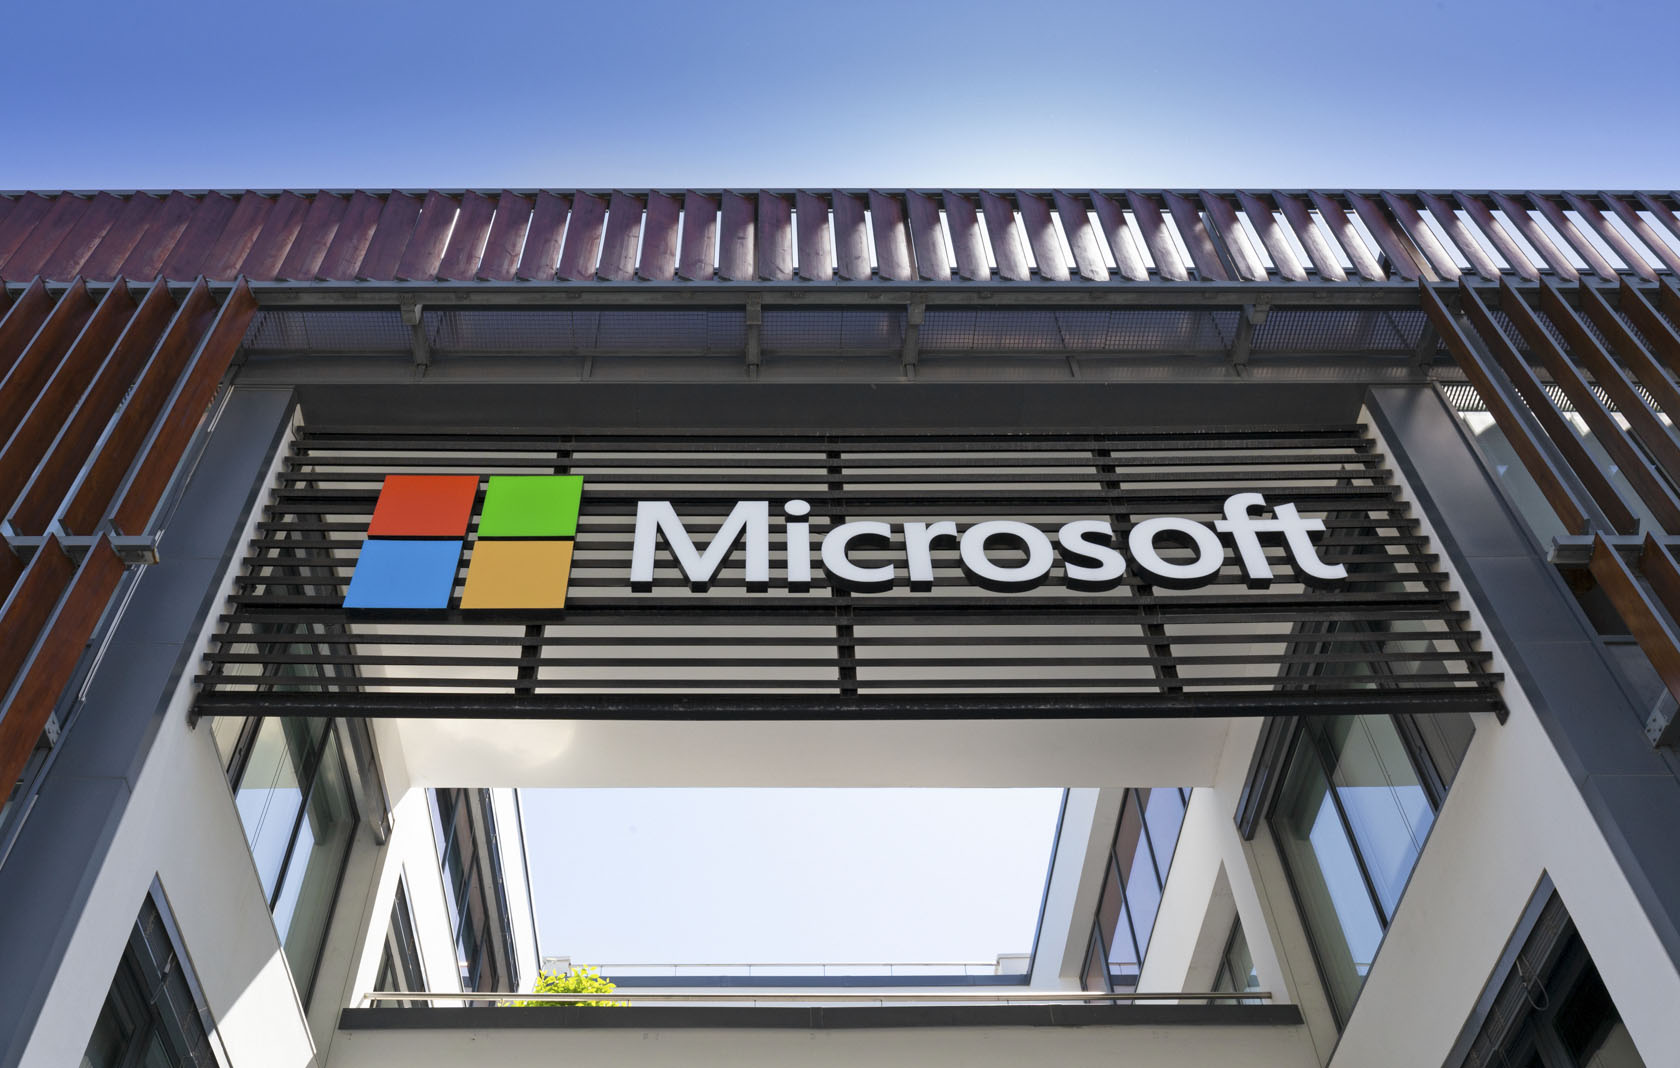 Microsoft_20190526_0261-2_copy_LR.jpg